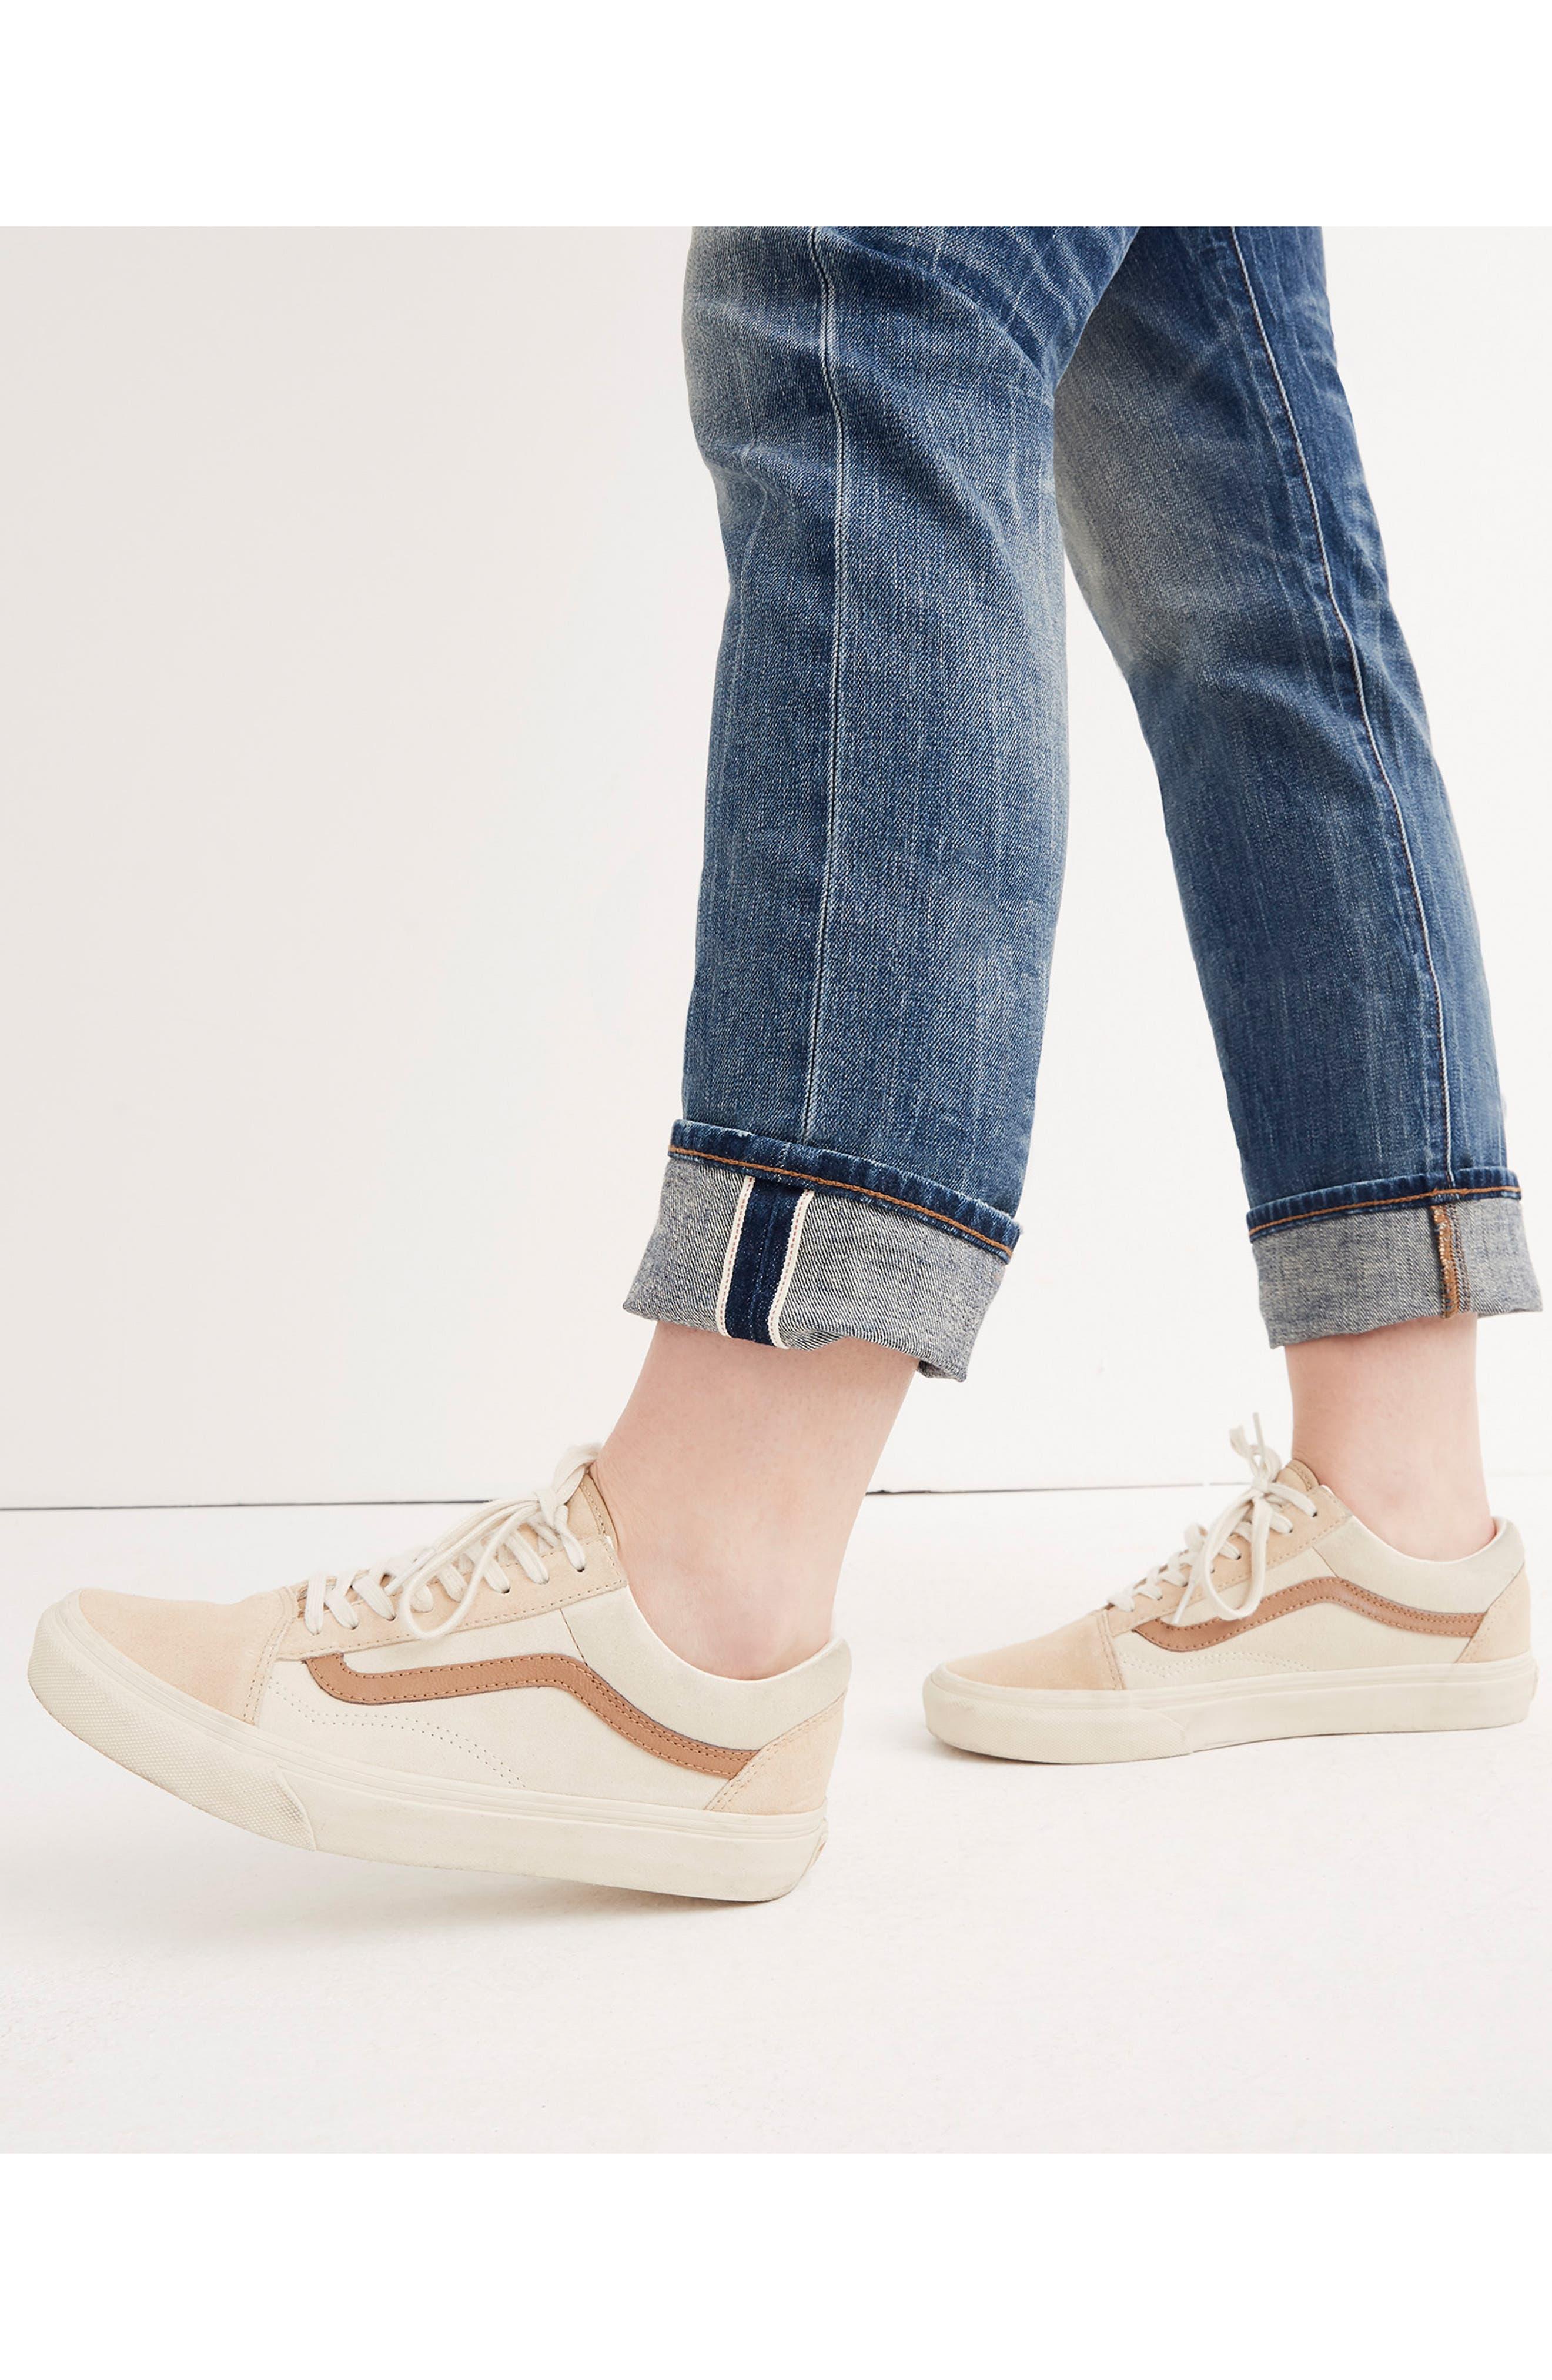 MADEWELL, Selvedge Distressed Straight Leg Jeans, Alternate thumbnail 7, color, CLOVERDALE